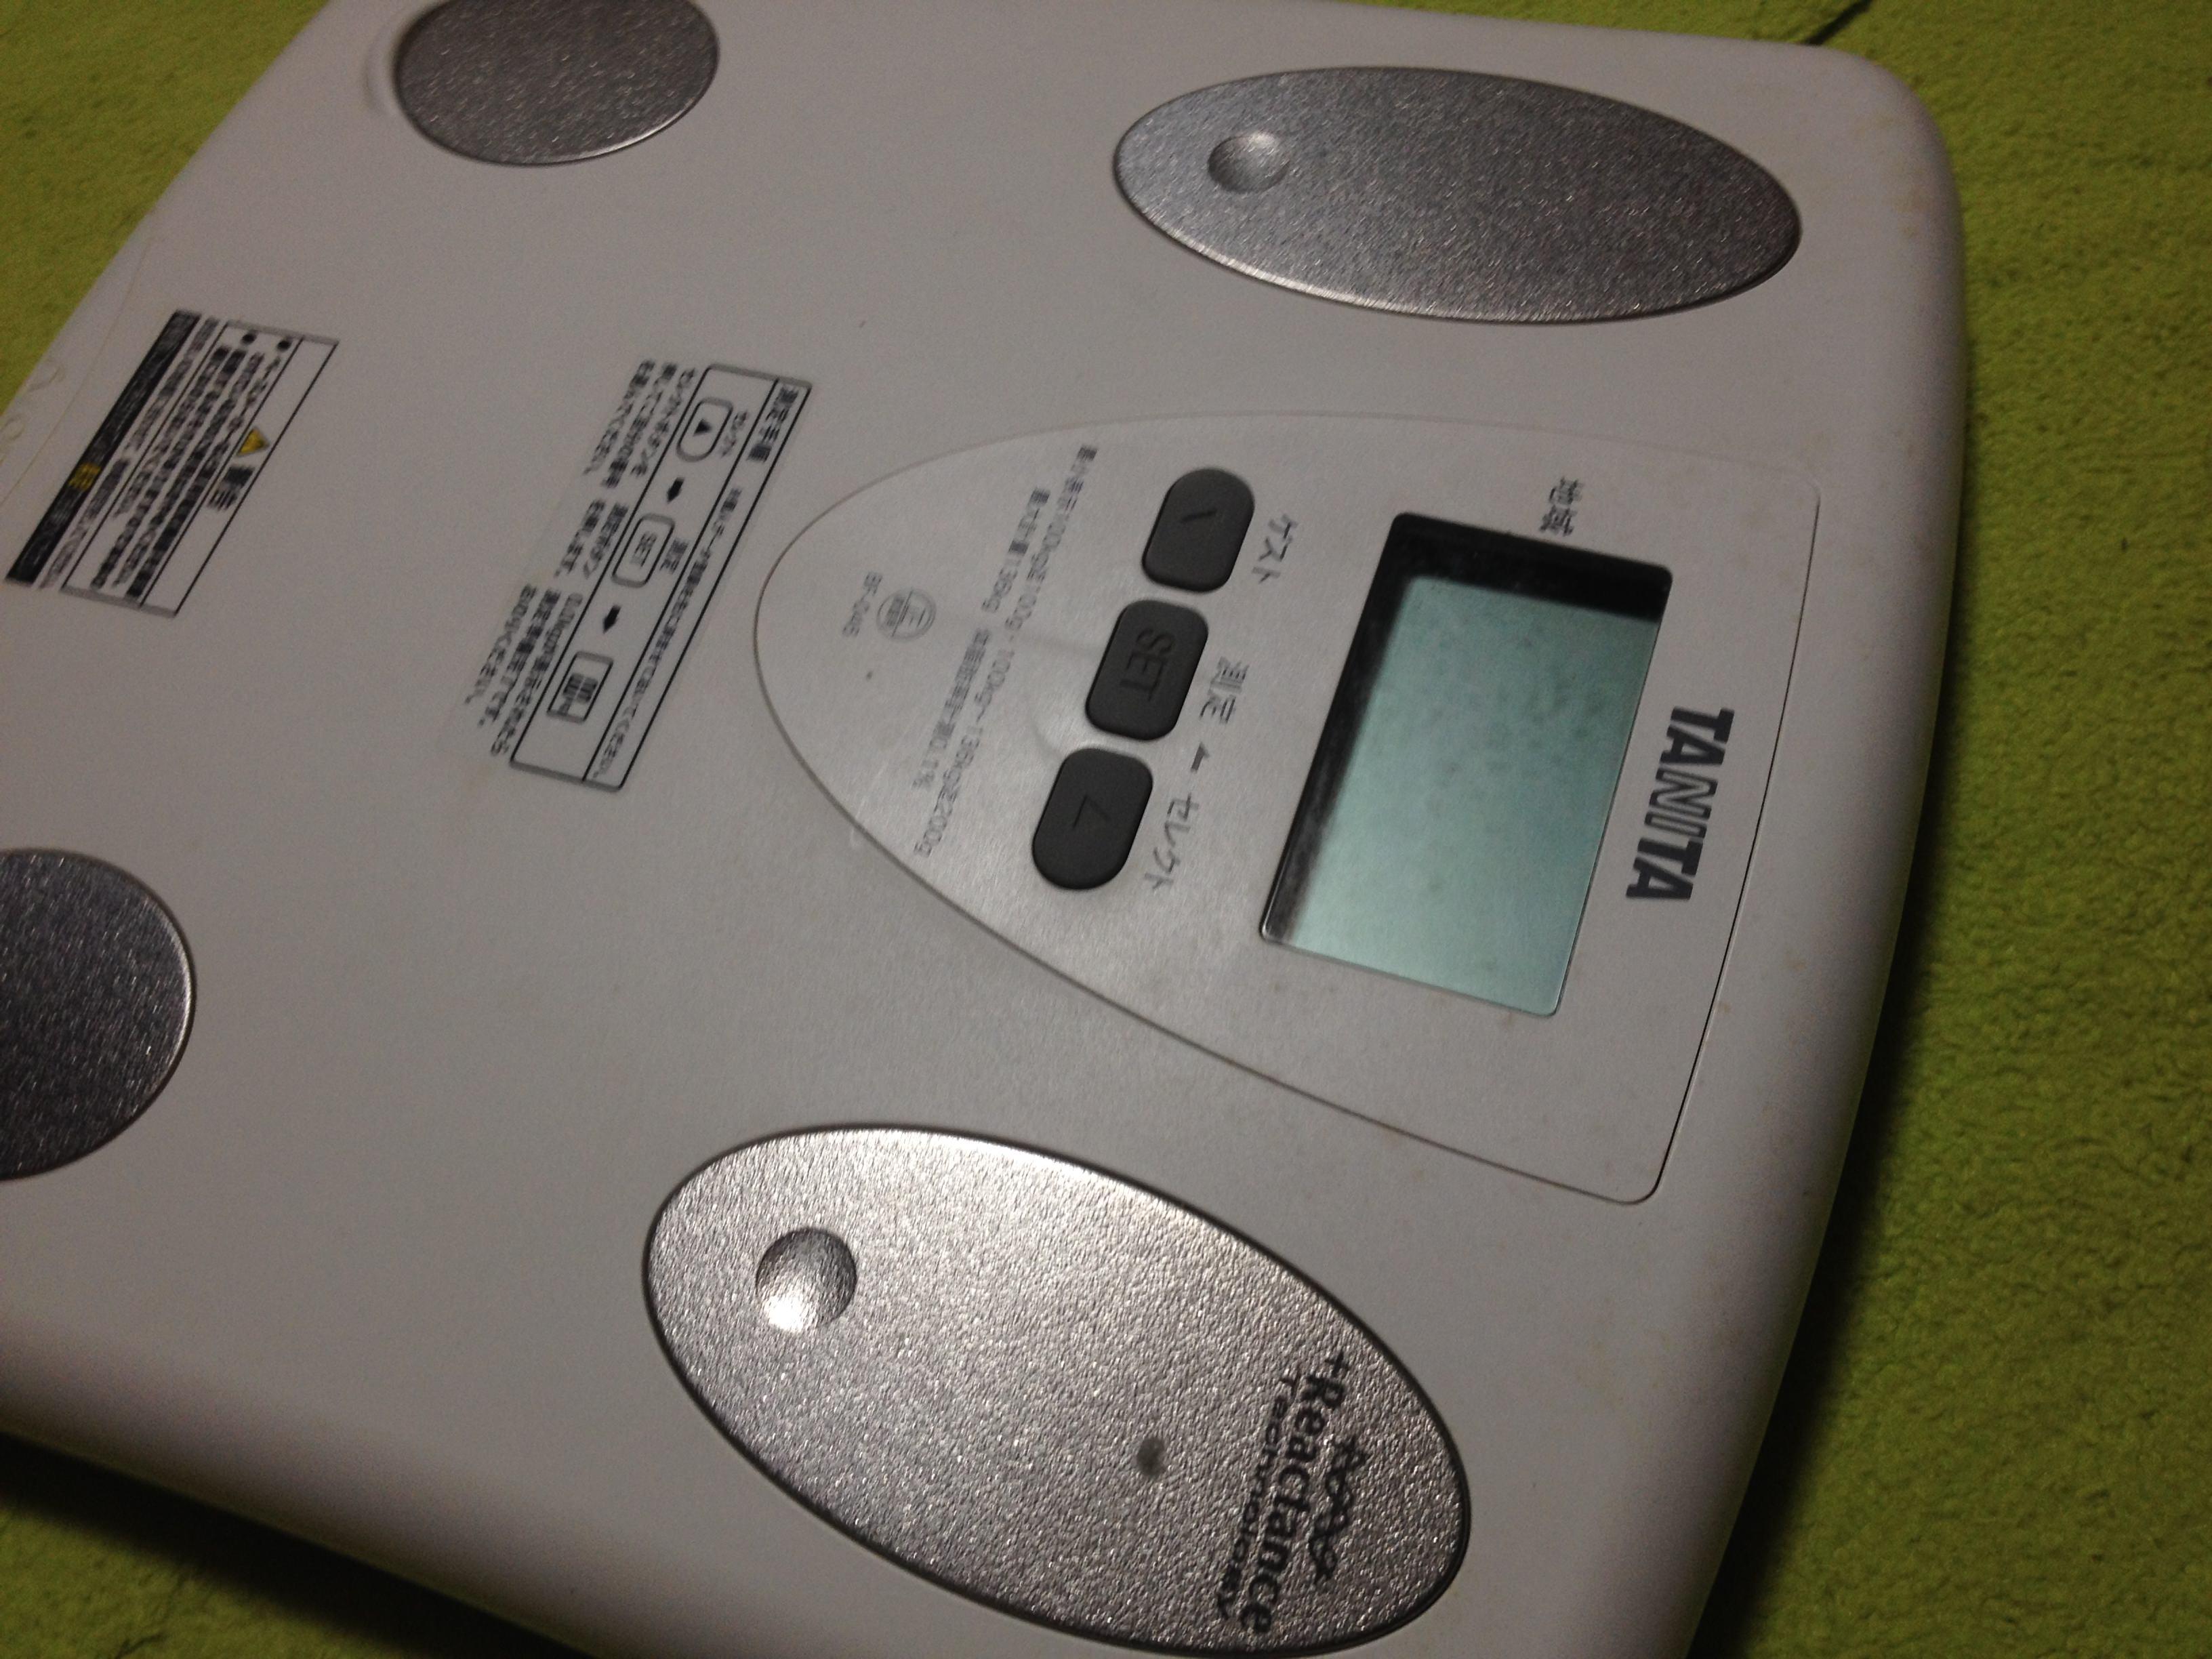 TANITAの体重計で体脂肪率を計測